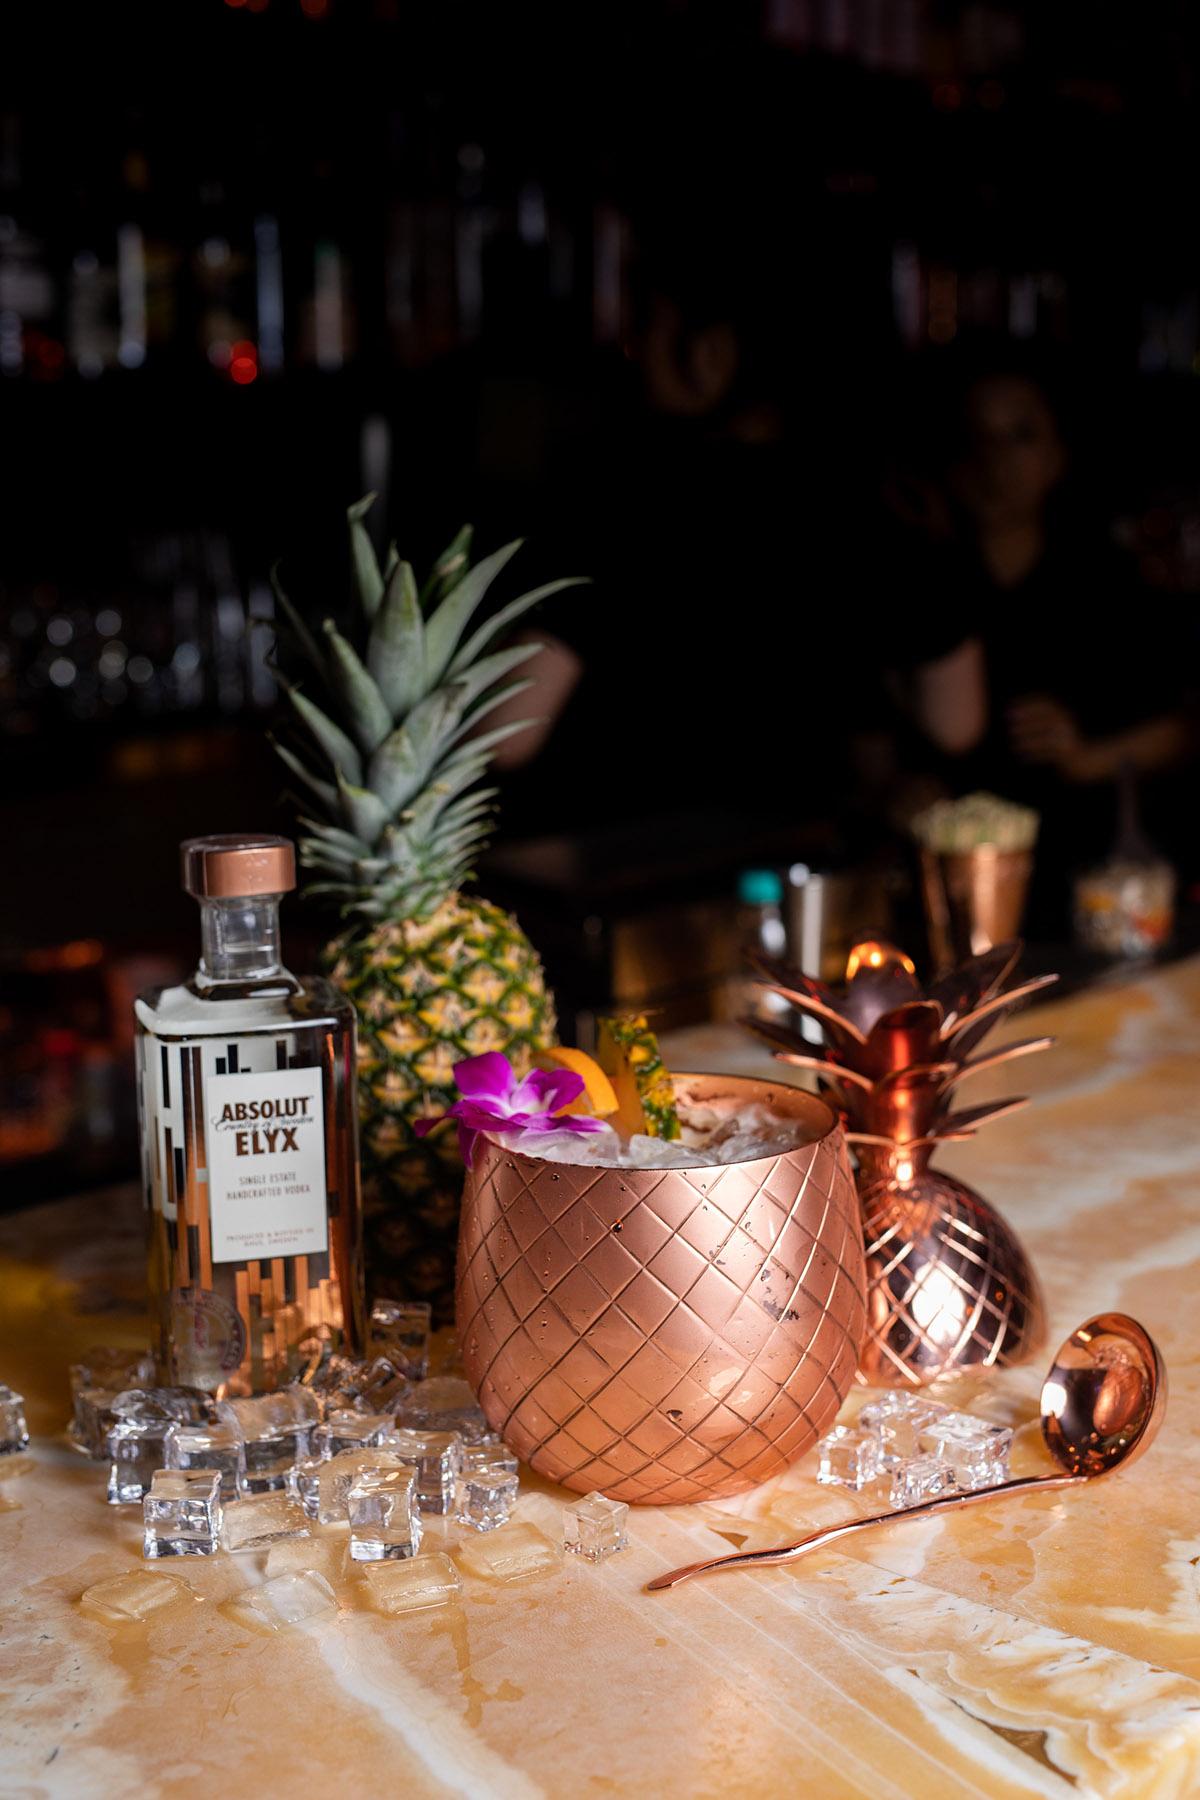 Elyx Pineapple Punchbowl for 4